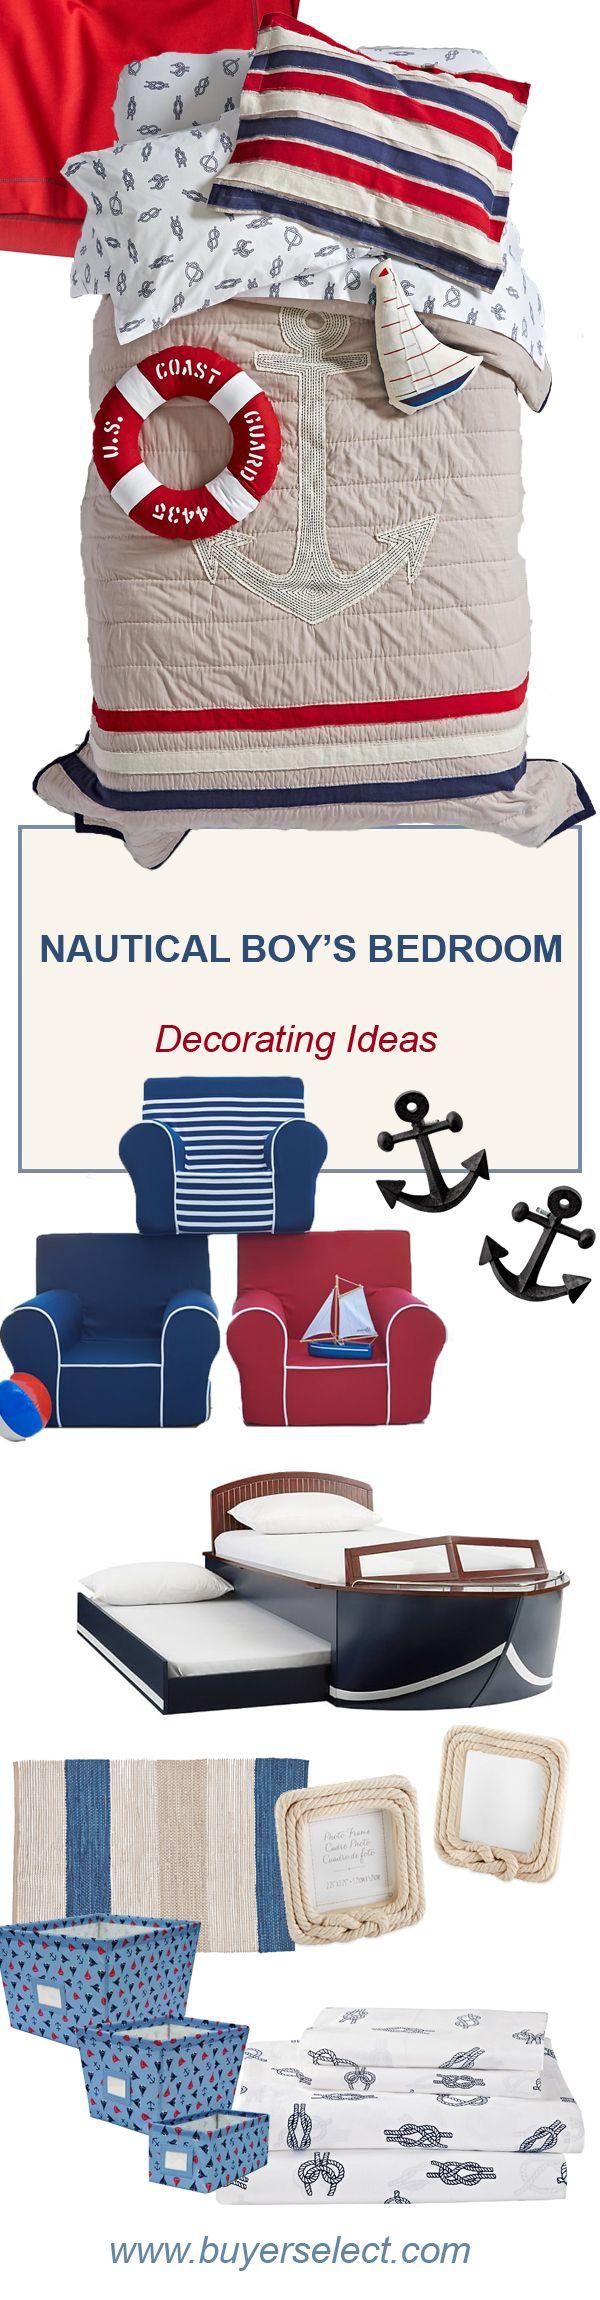 Kid's Nautical Bedroom | Boys Bedroom Ideas | Kid's Rooms